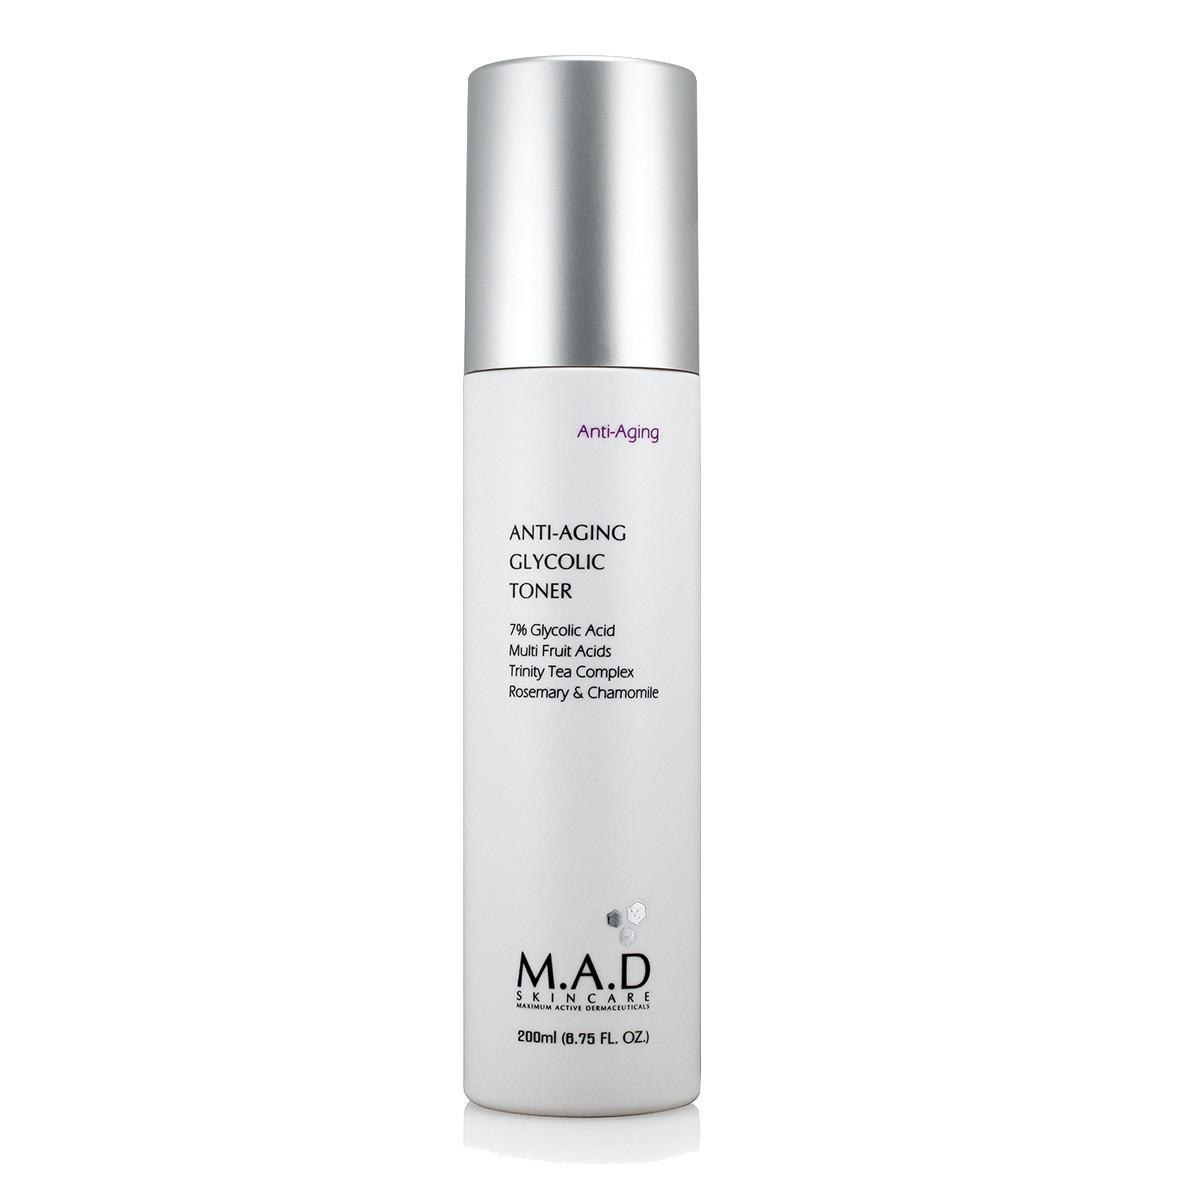 M.A.D. Тоник с 7% гликолевой кислотой предотвращающий старение кожи 200 мл (M.A.D., Anti-Age)